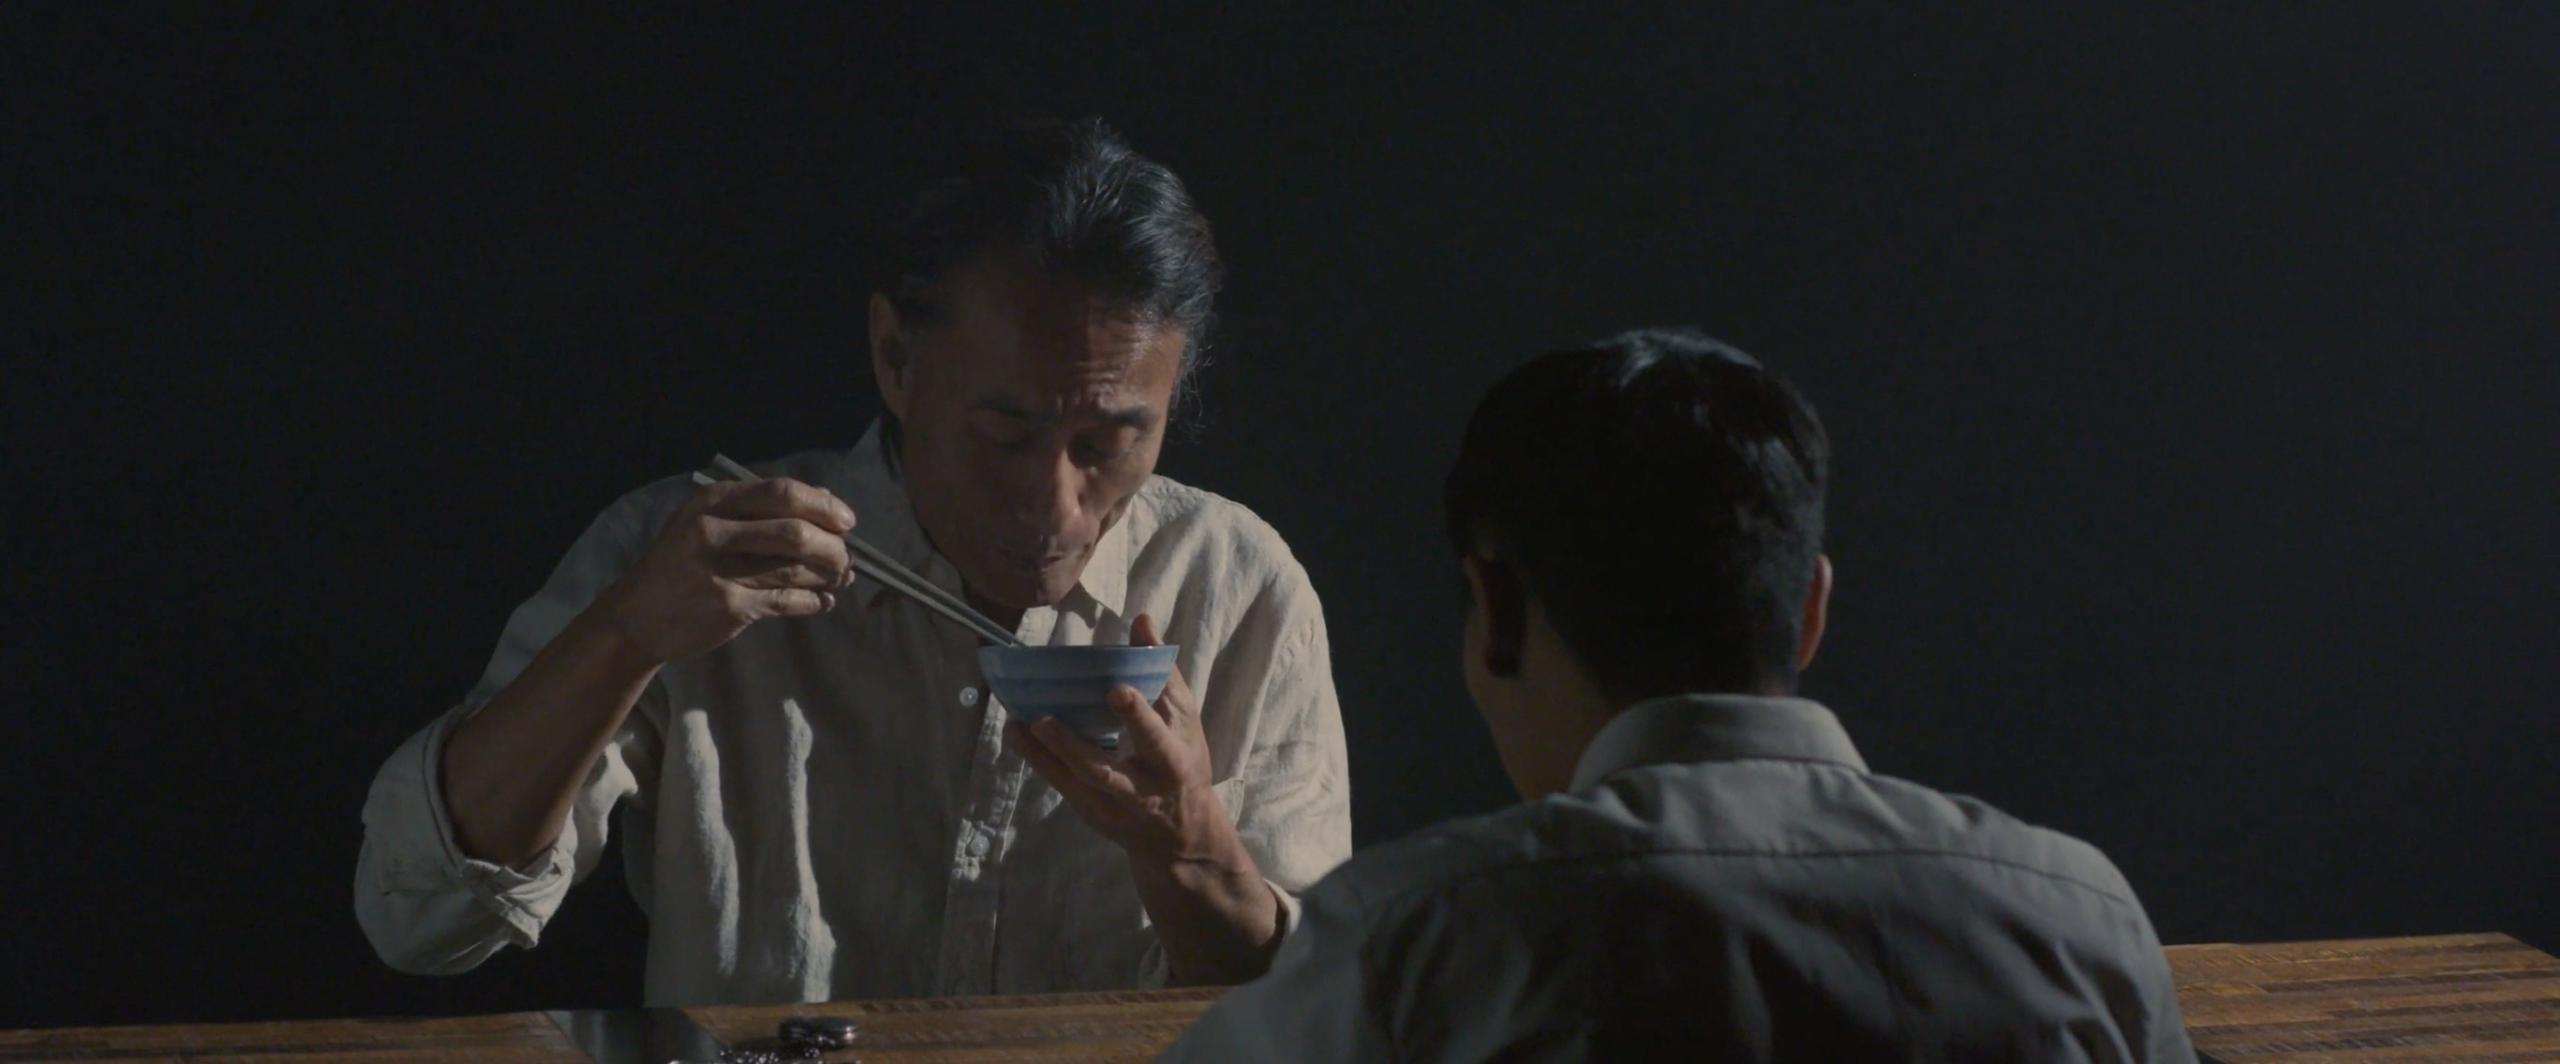 Fukuichi and Shinji Mikamo eat breakfast, pre-bomb on August 6th, 1945